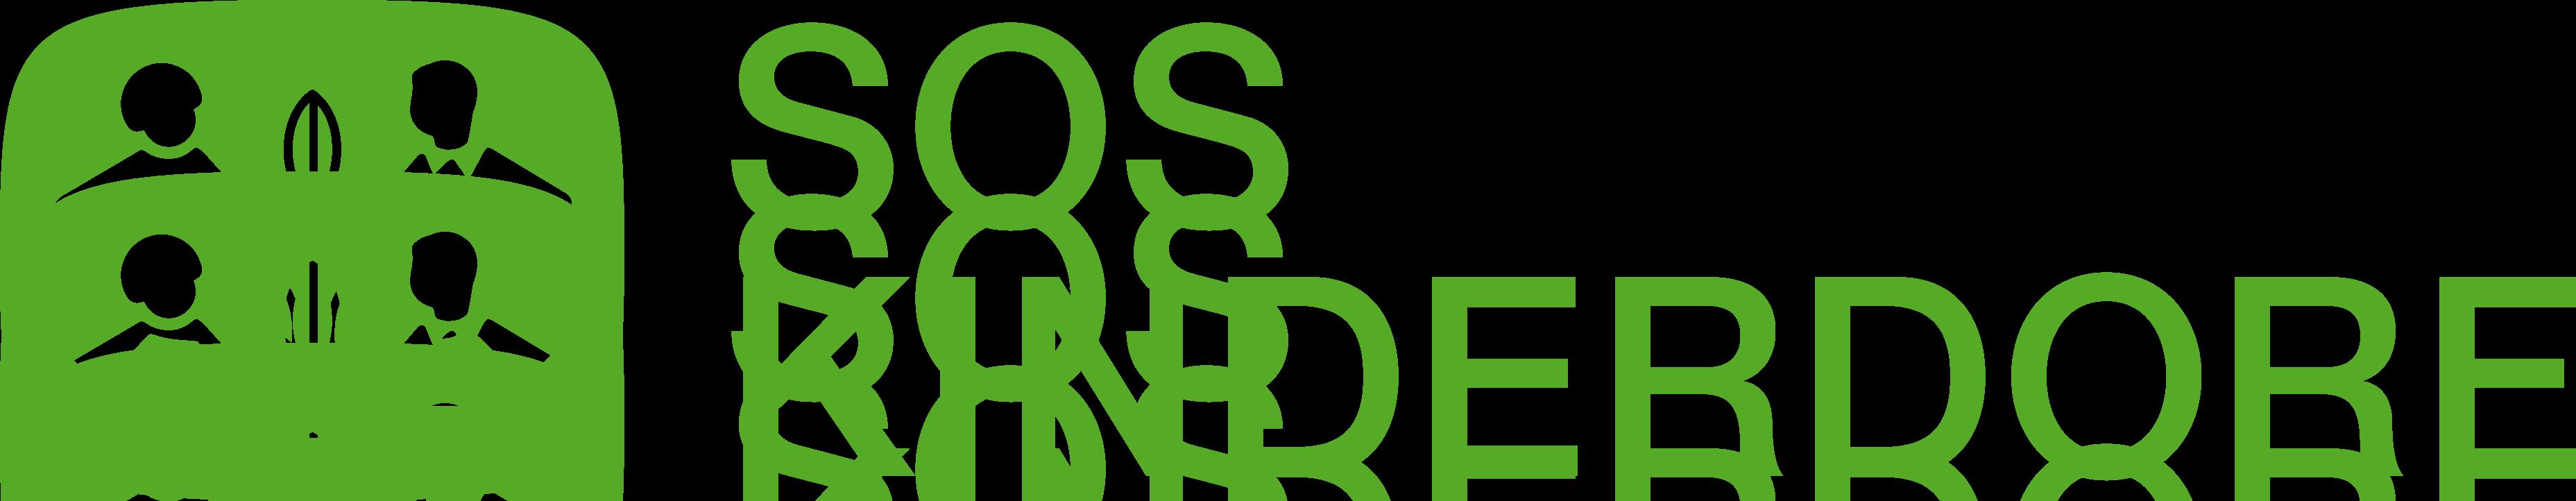 SOS_Logo_2012_CMYK_1200_895